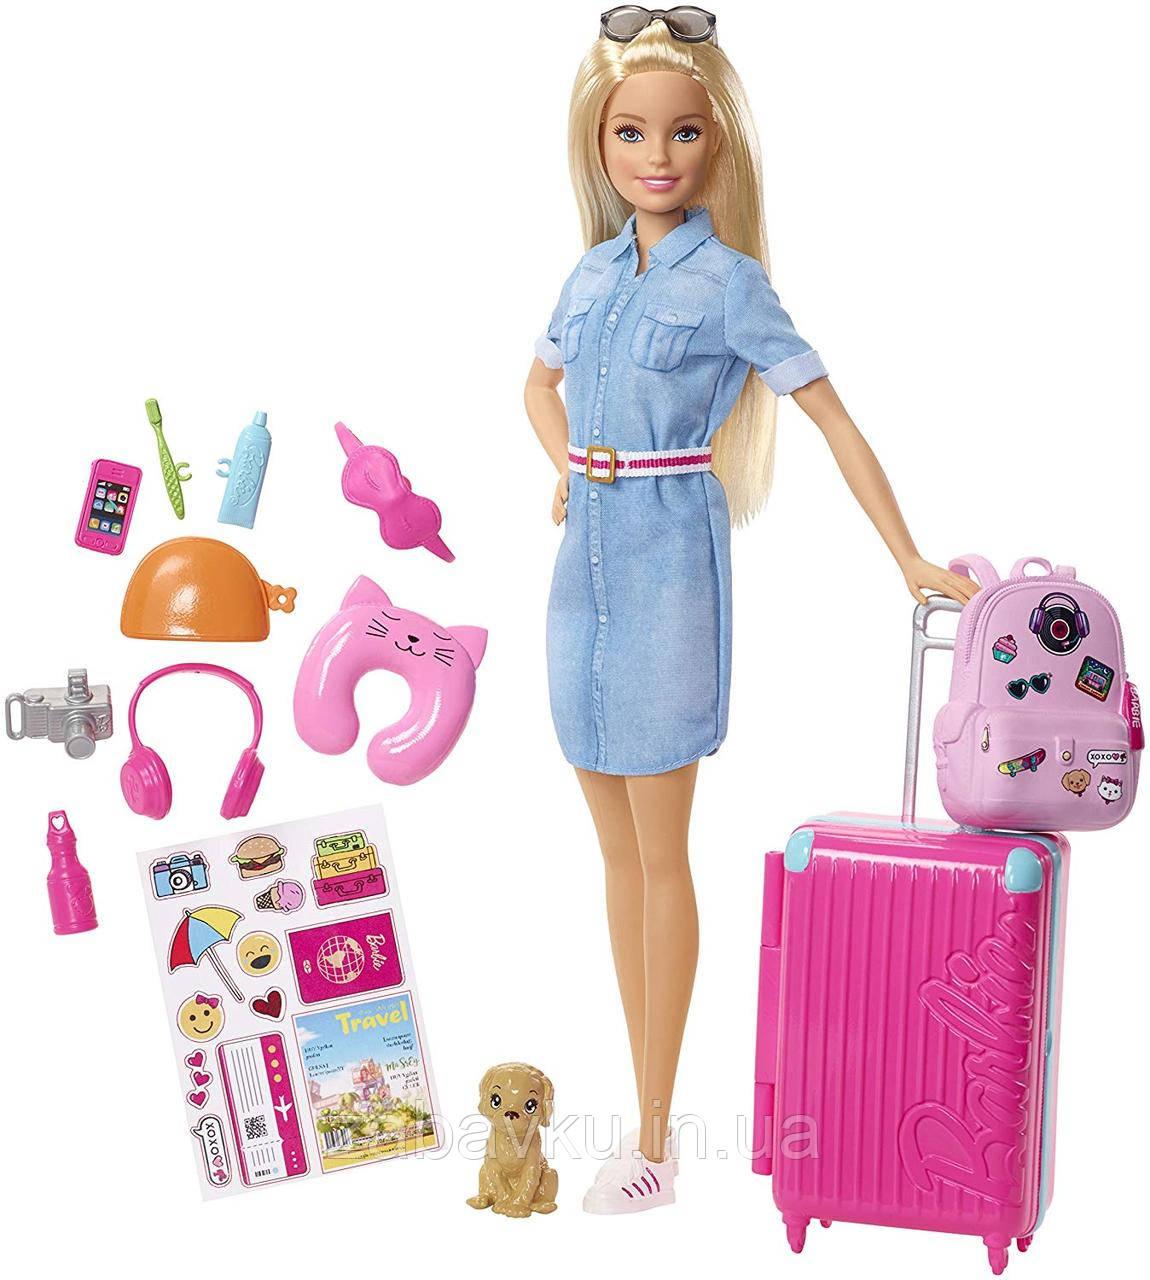 Кукла Барби путешественница набор блондинка Barbie Travel Doll Blonde Лялька Барбі подорож набір